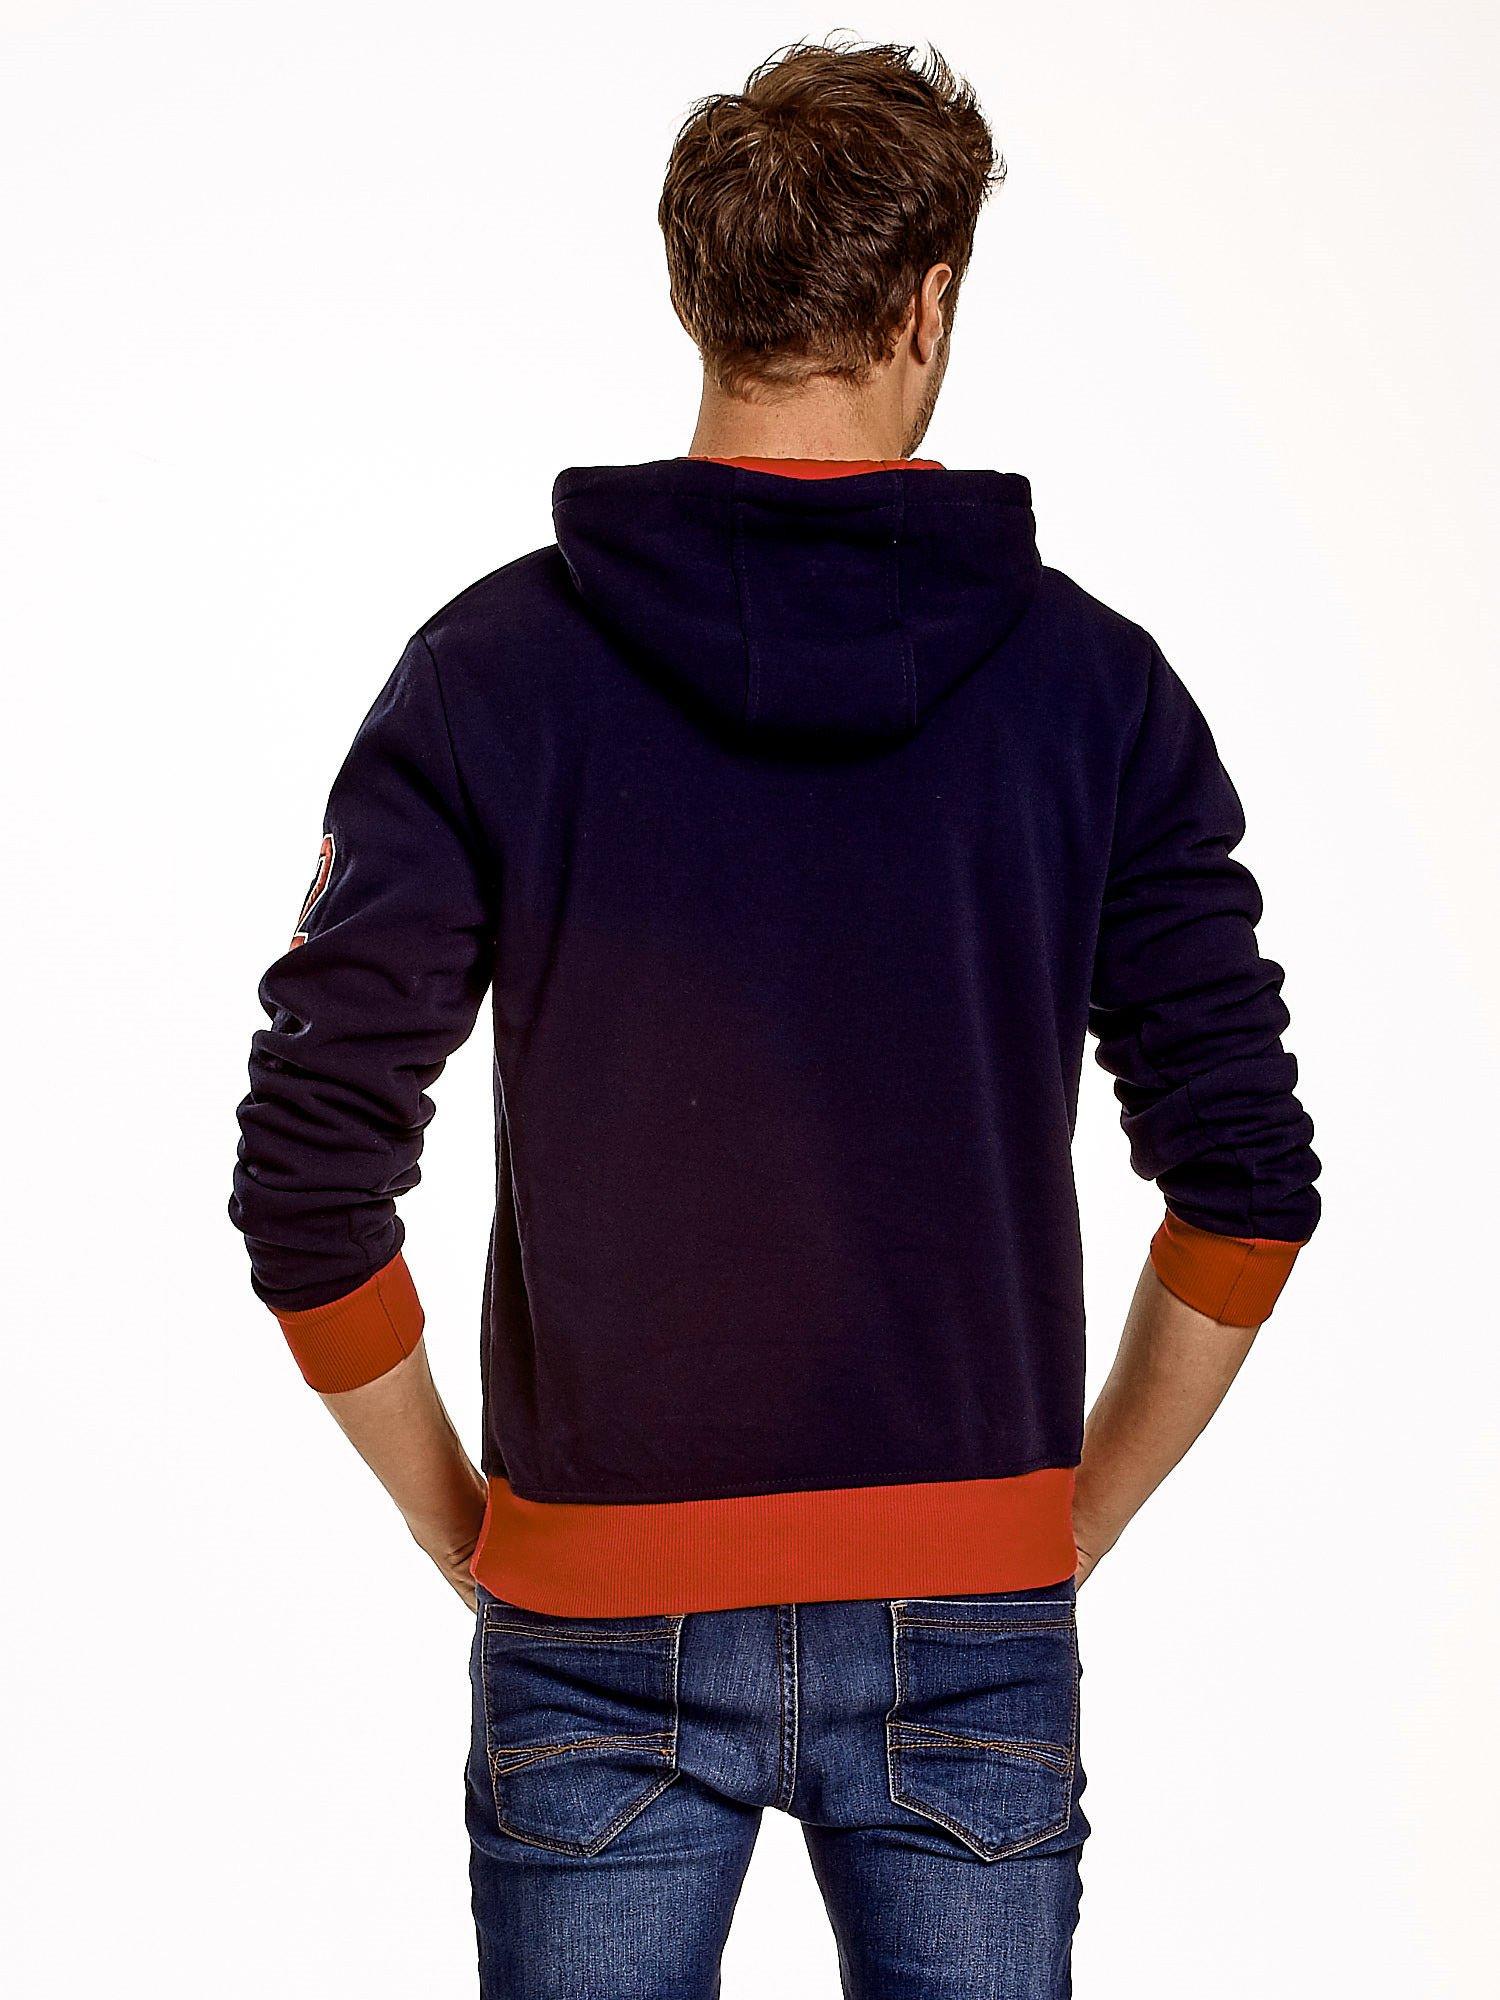 Granatowa ocieplana bluza męska z napisem CALIFORNIA i kapturem                                  zdj.                                  3